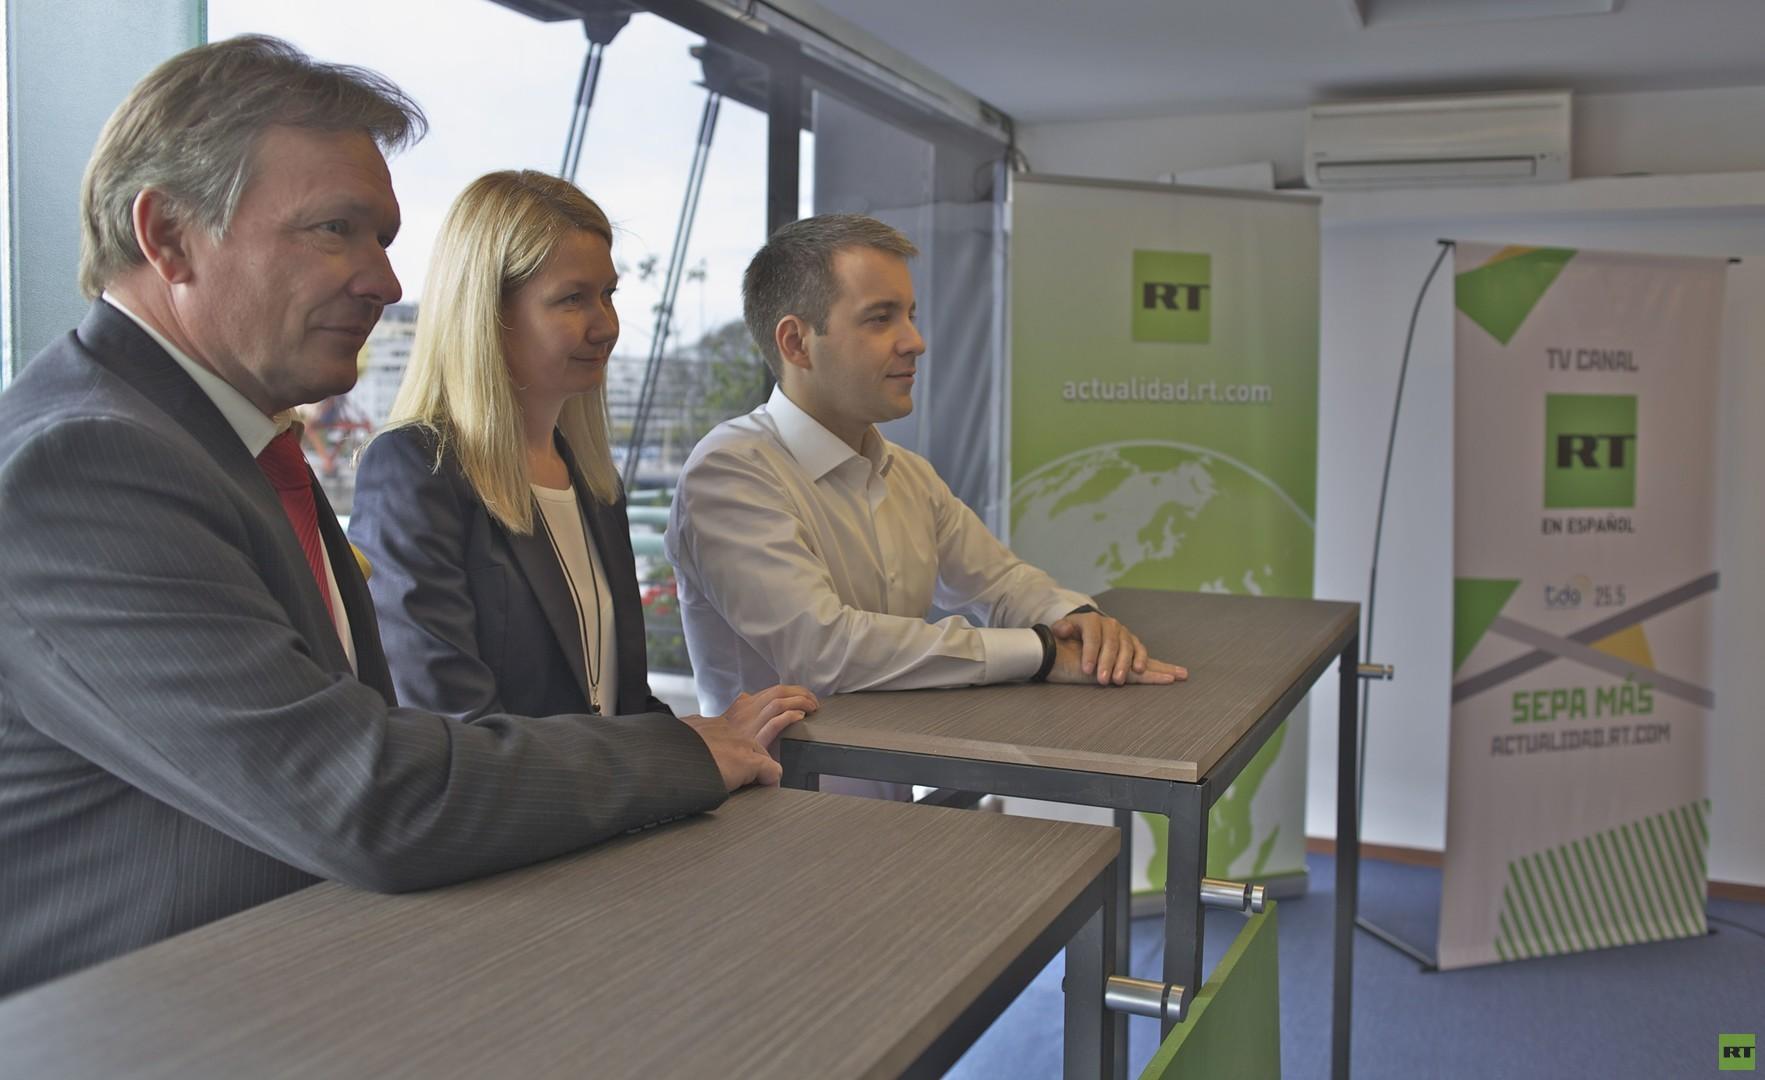 Глава Минкомсвязи России посетил офис RT на испанском